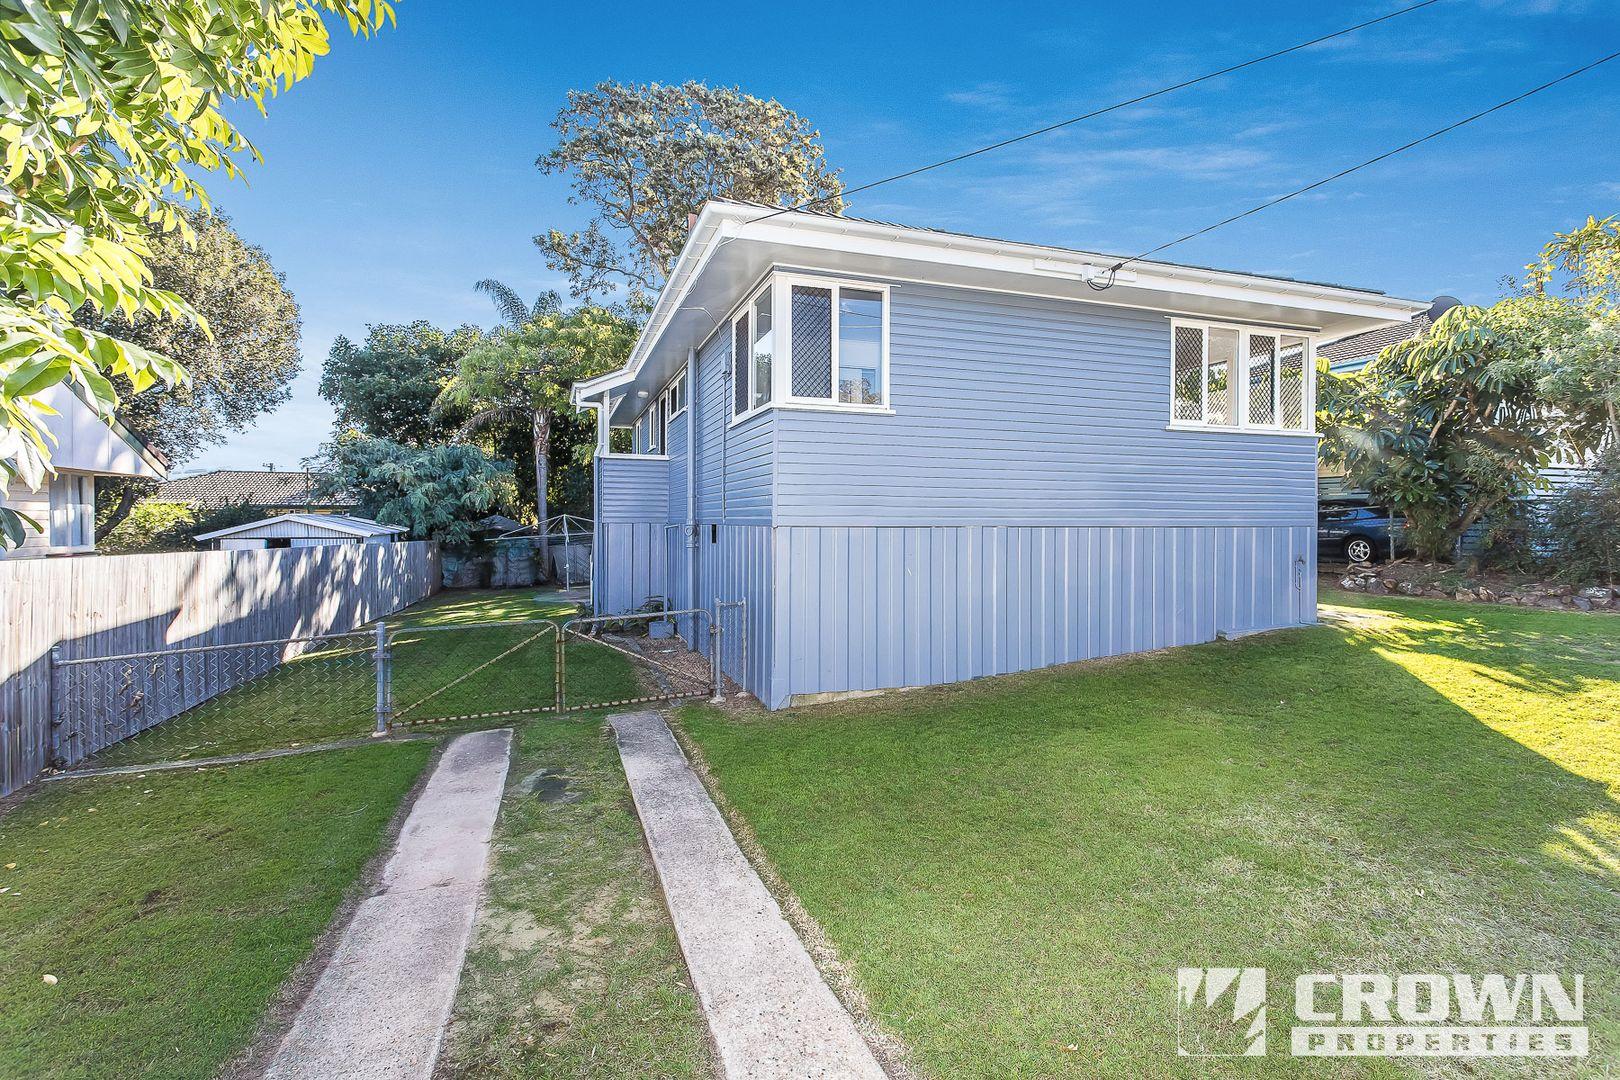 27 Pownall Cresent, Margate QLD 4019, Image 0